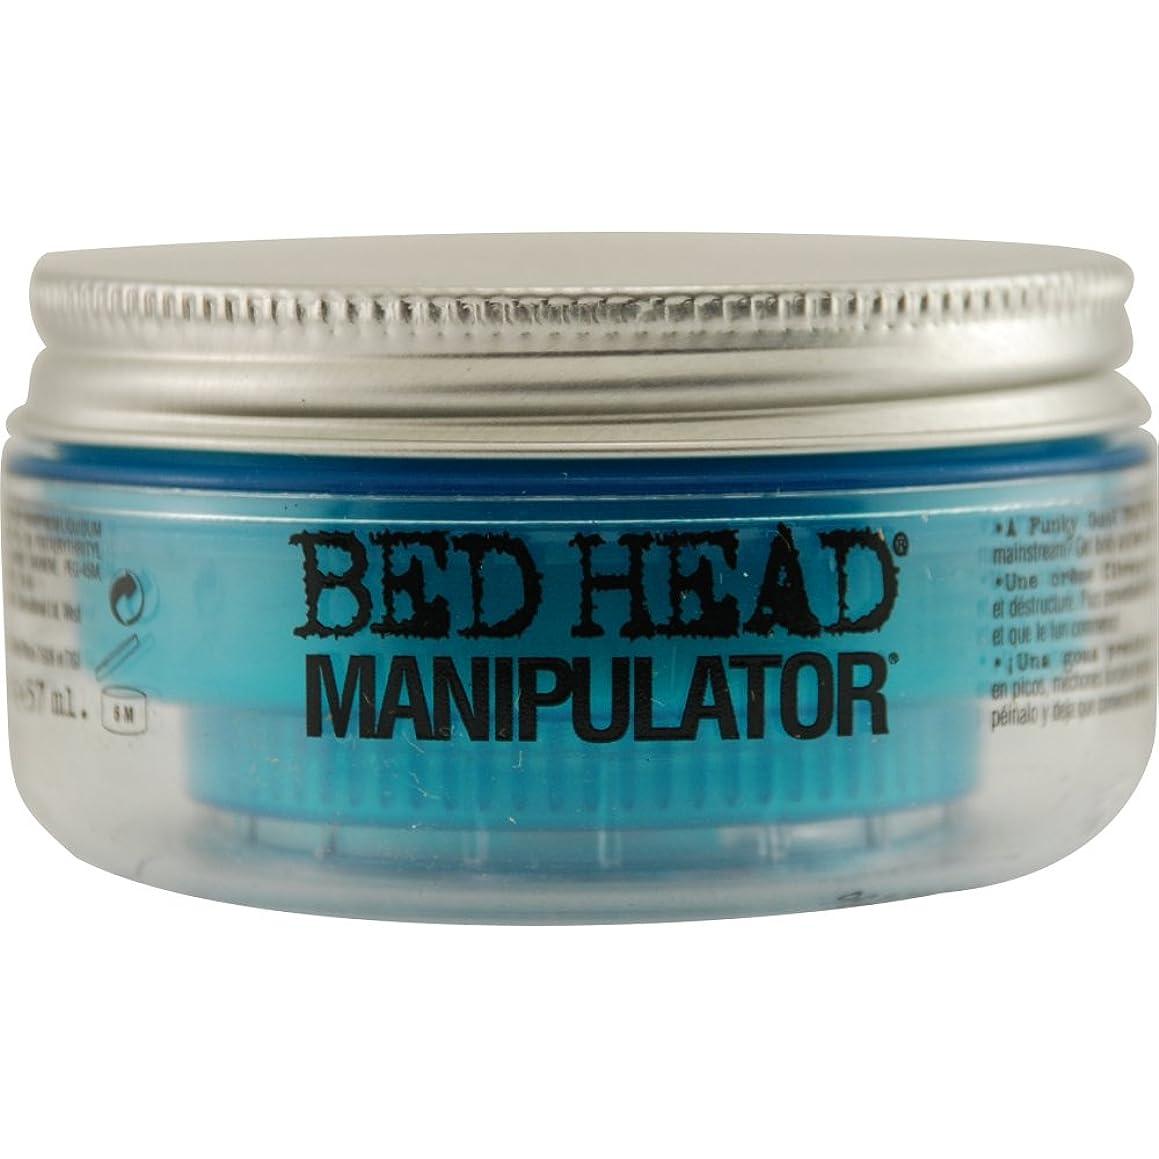 TIGI Bed Head Manipulator, 2 Ounce (Pack of 2)